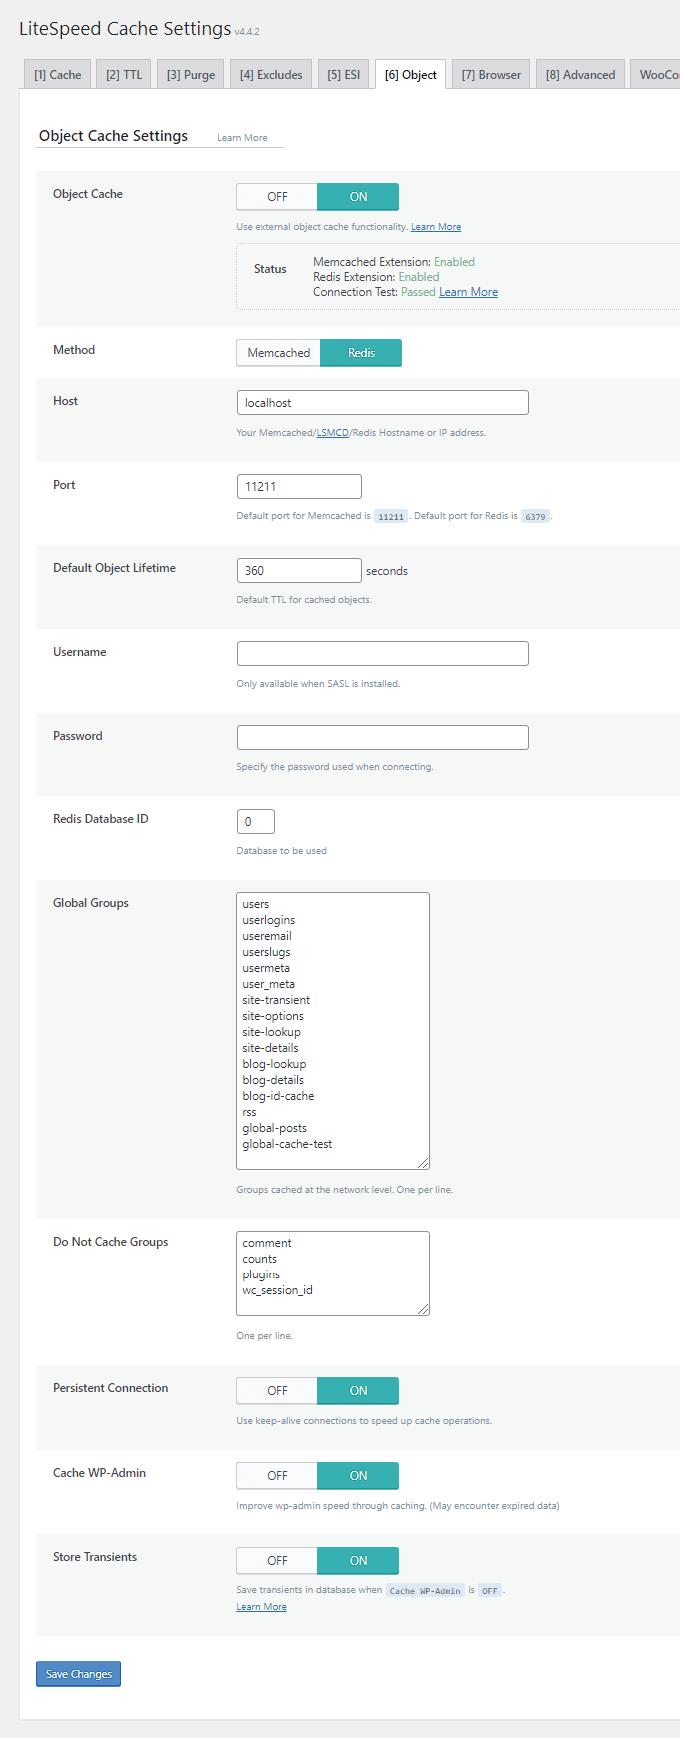 LiteSpeed Cache Object Cache Settings